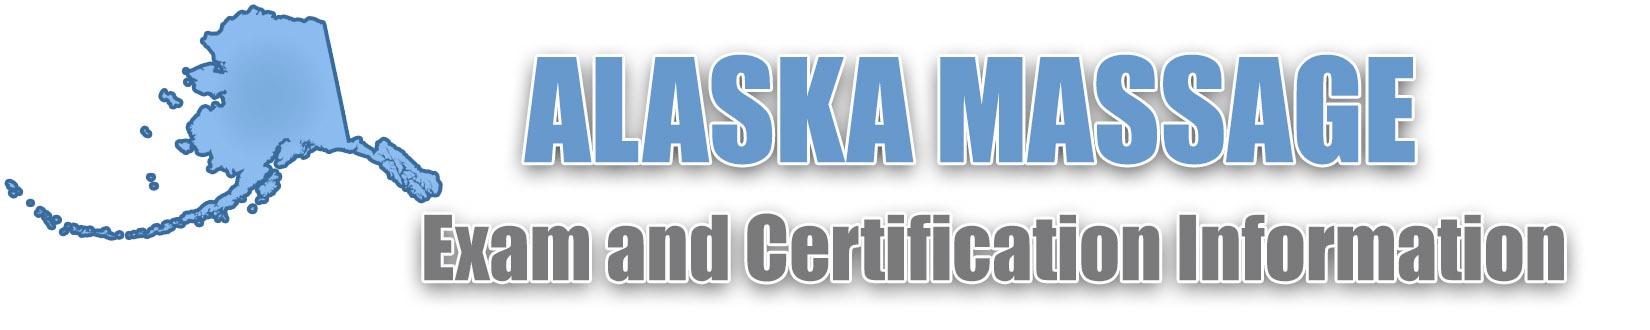 Alaska Massage Licensure Requirements